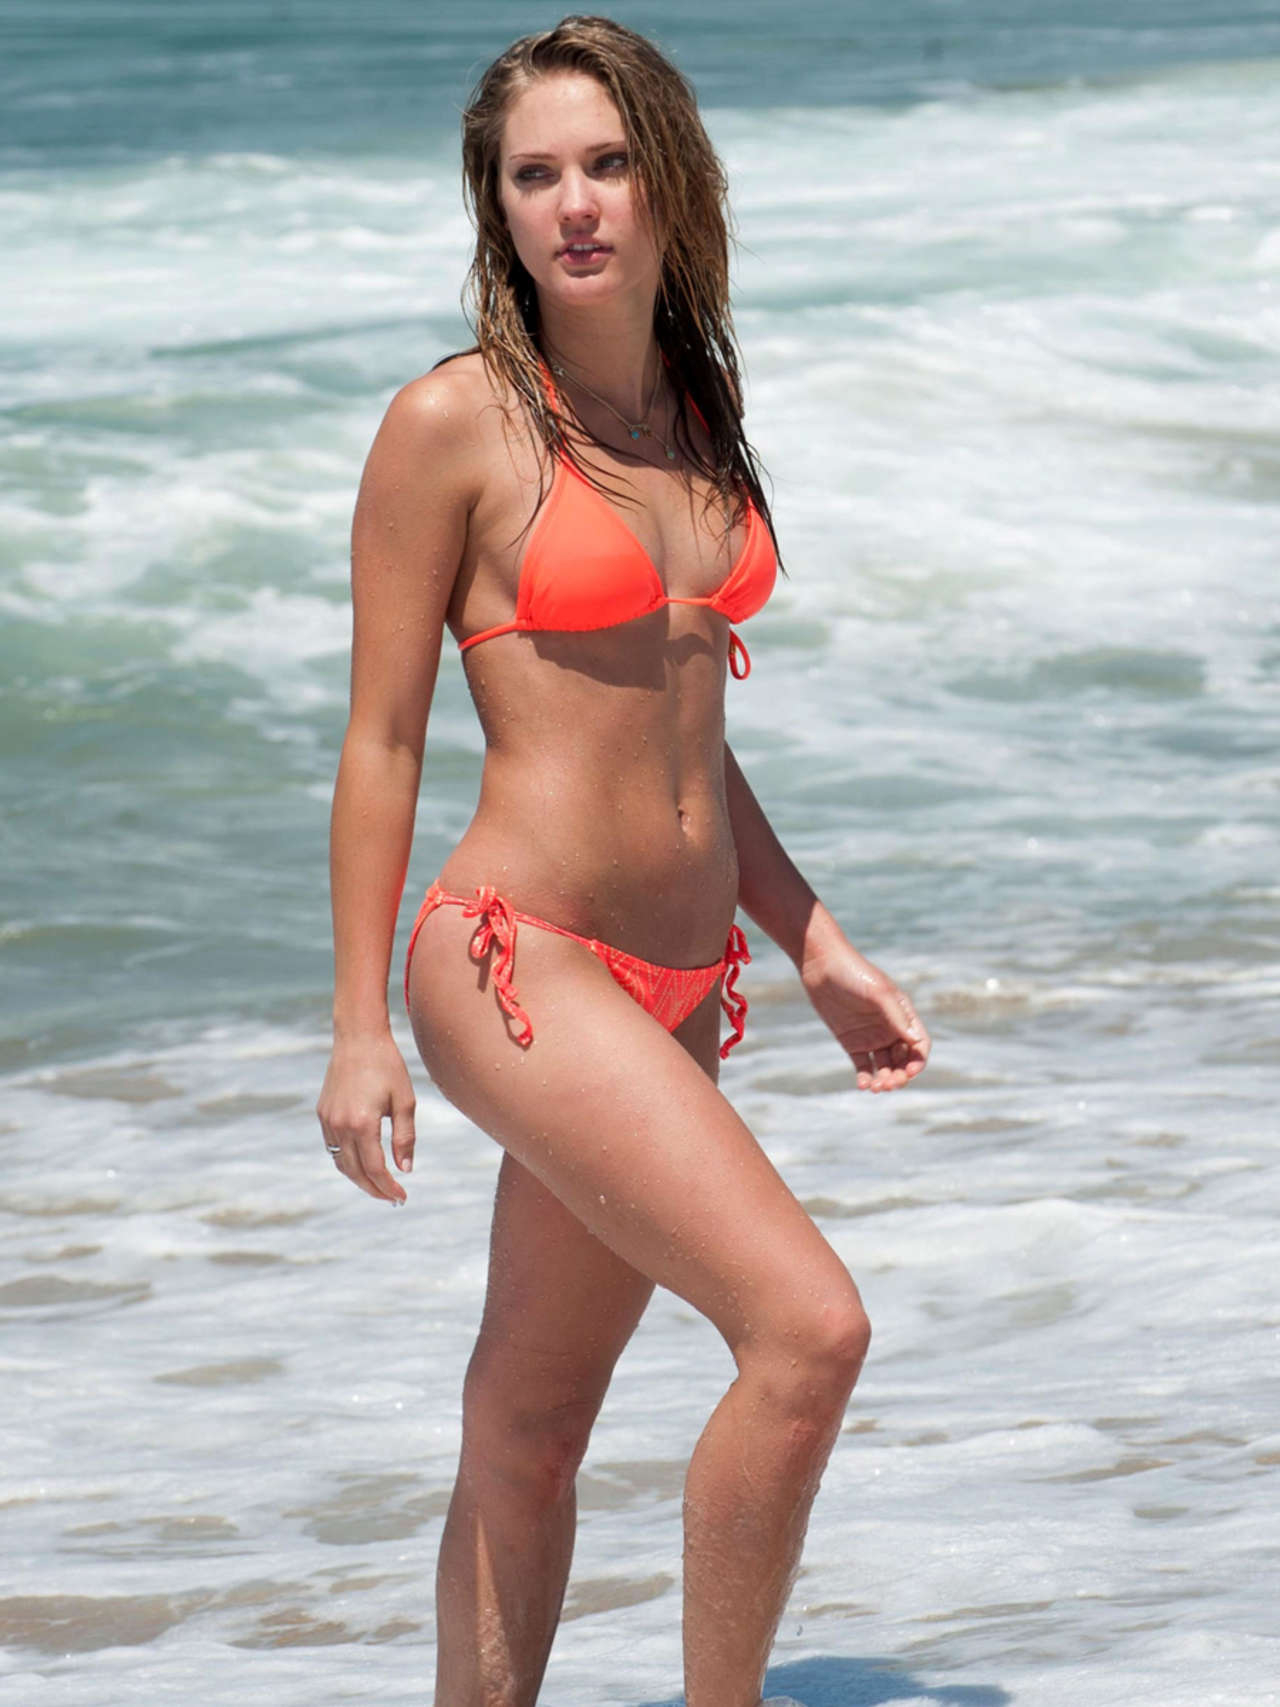 Ciara Hanna Bikini 2014 -08 - Full SizeCiara Hanna Hot